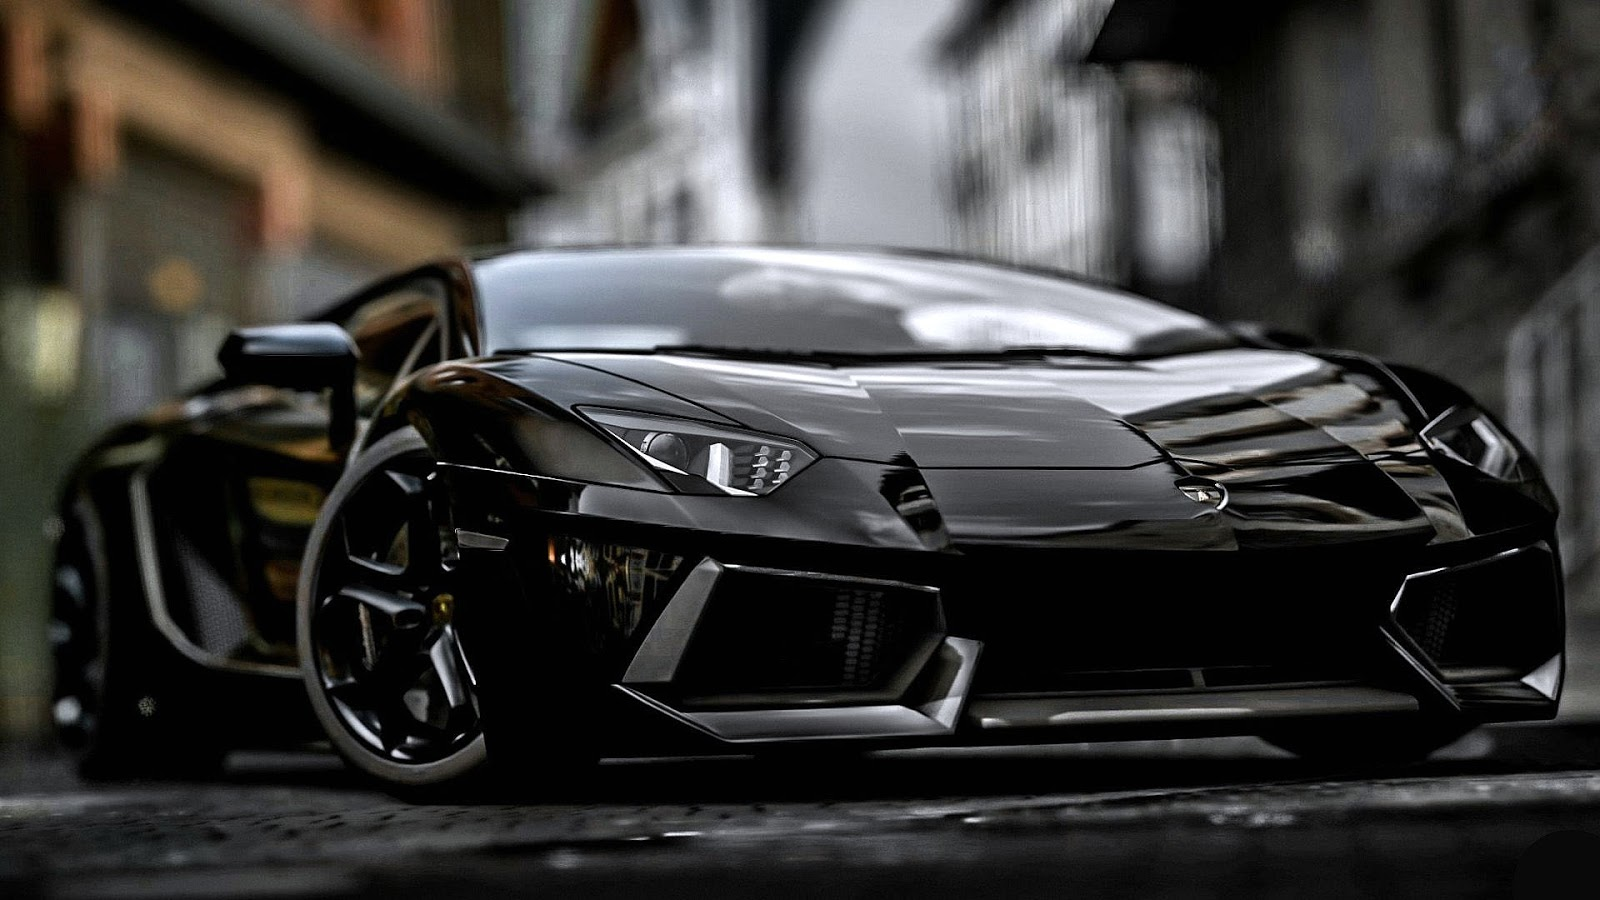 HD Lamborghini Wallpapers